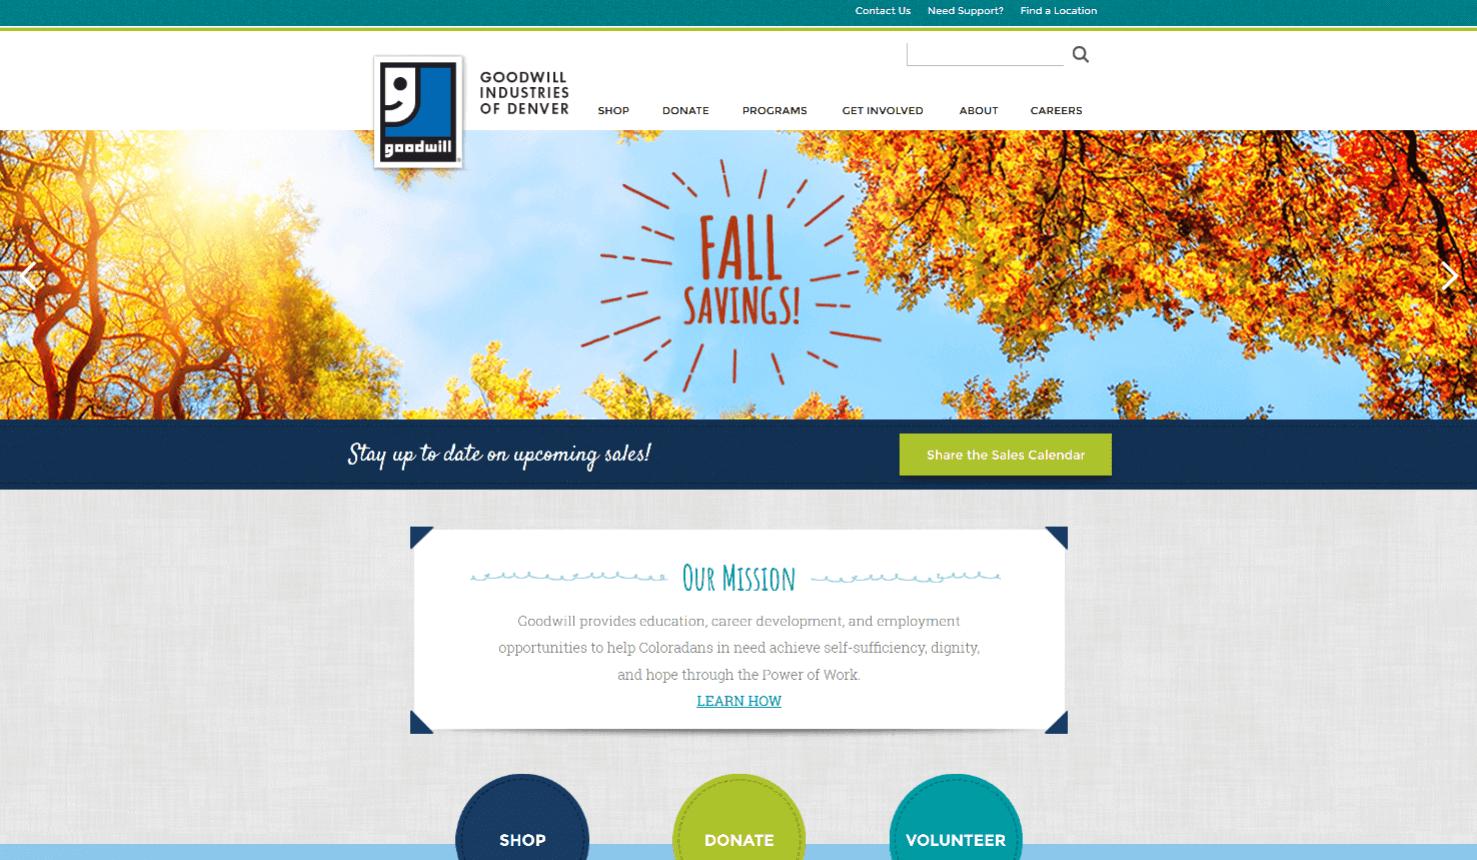 nonprofit custom design Goodwill Industries of Denver